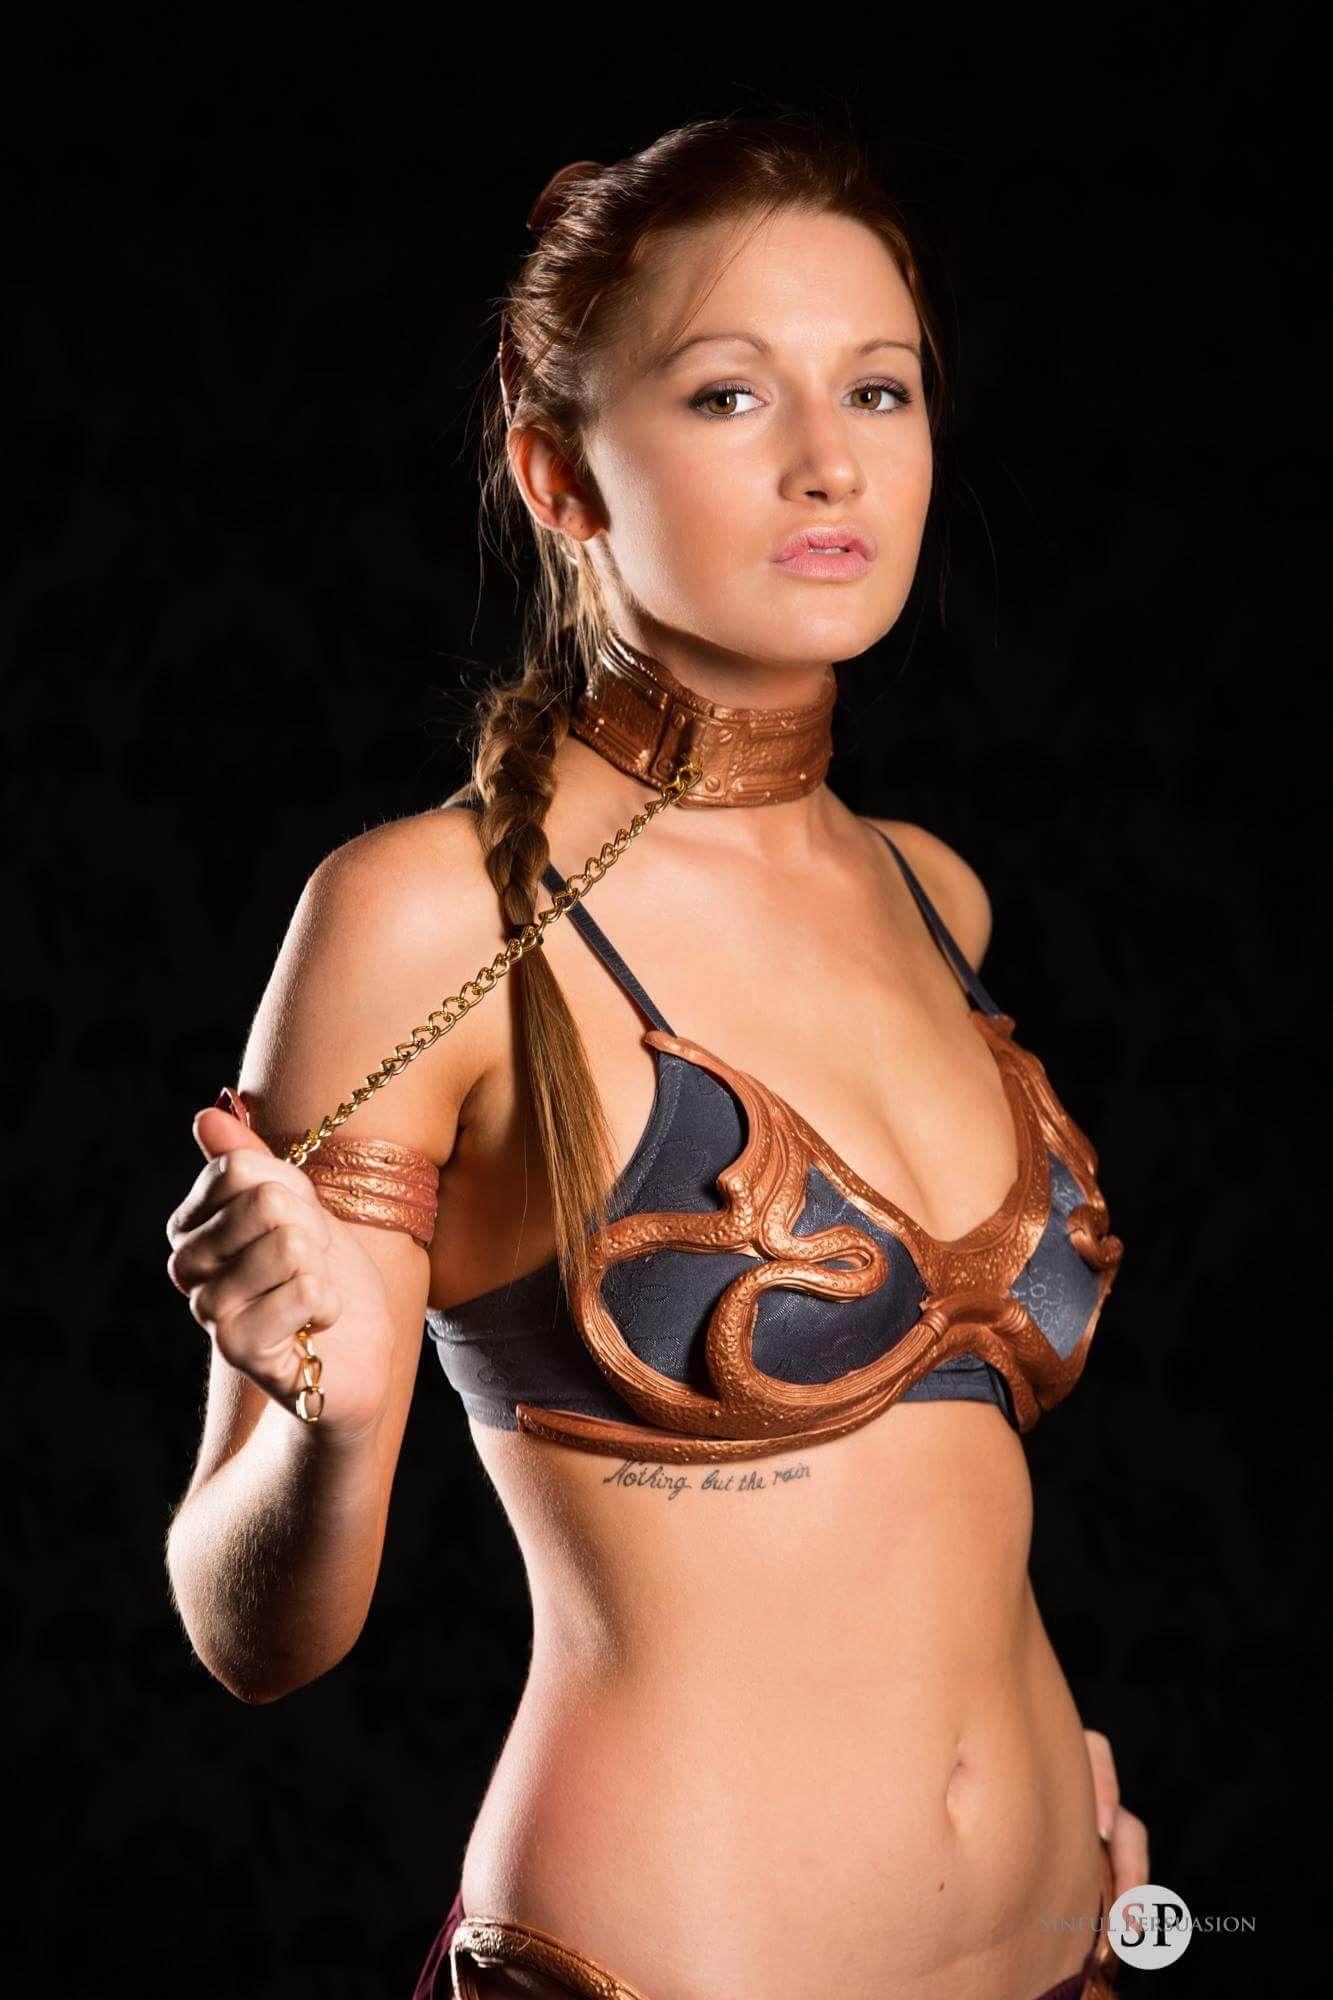 Pin on Star Wars (Slave Leia)